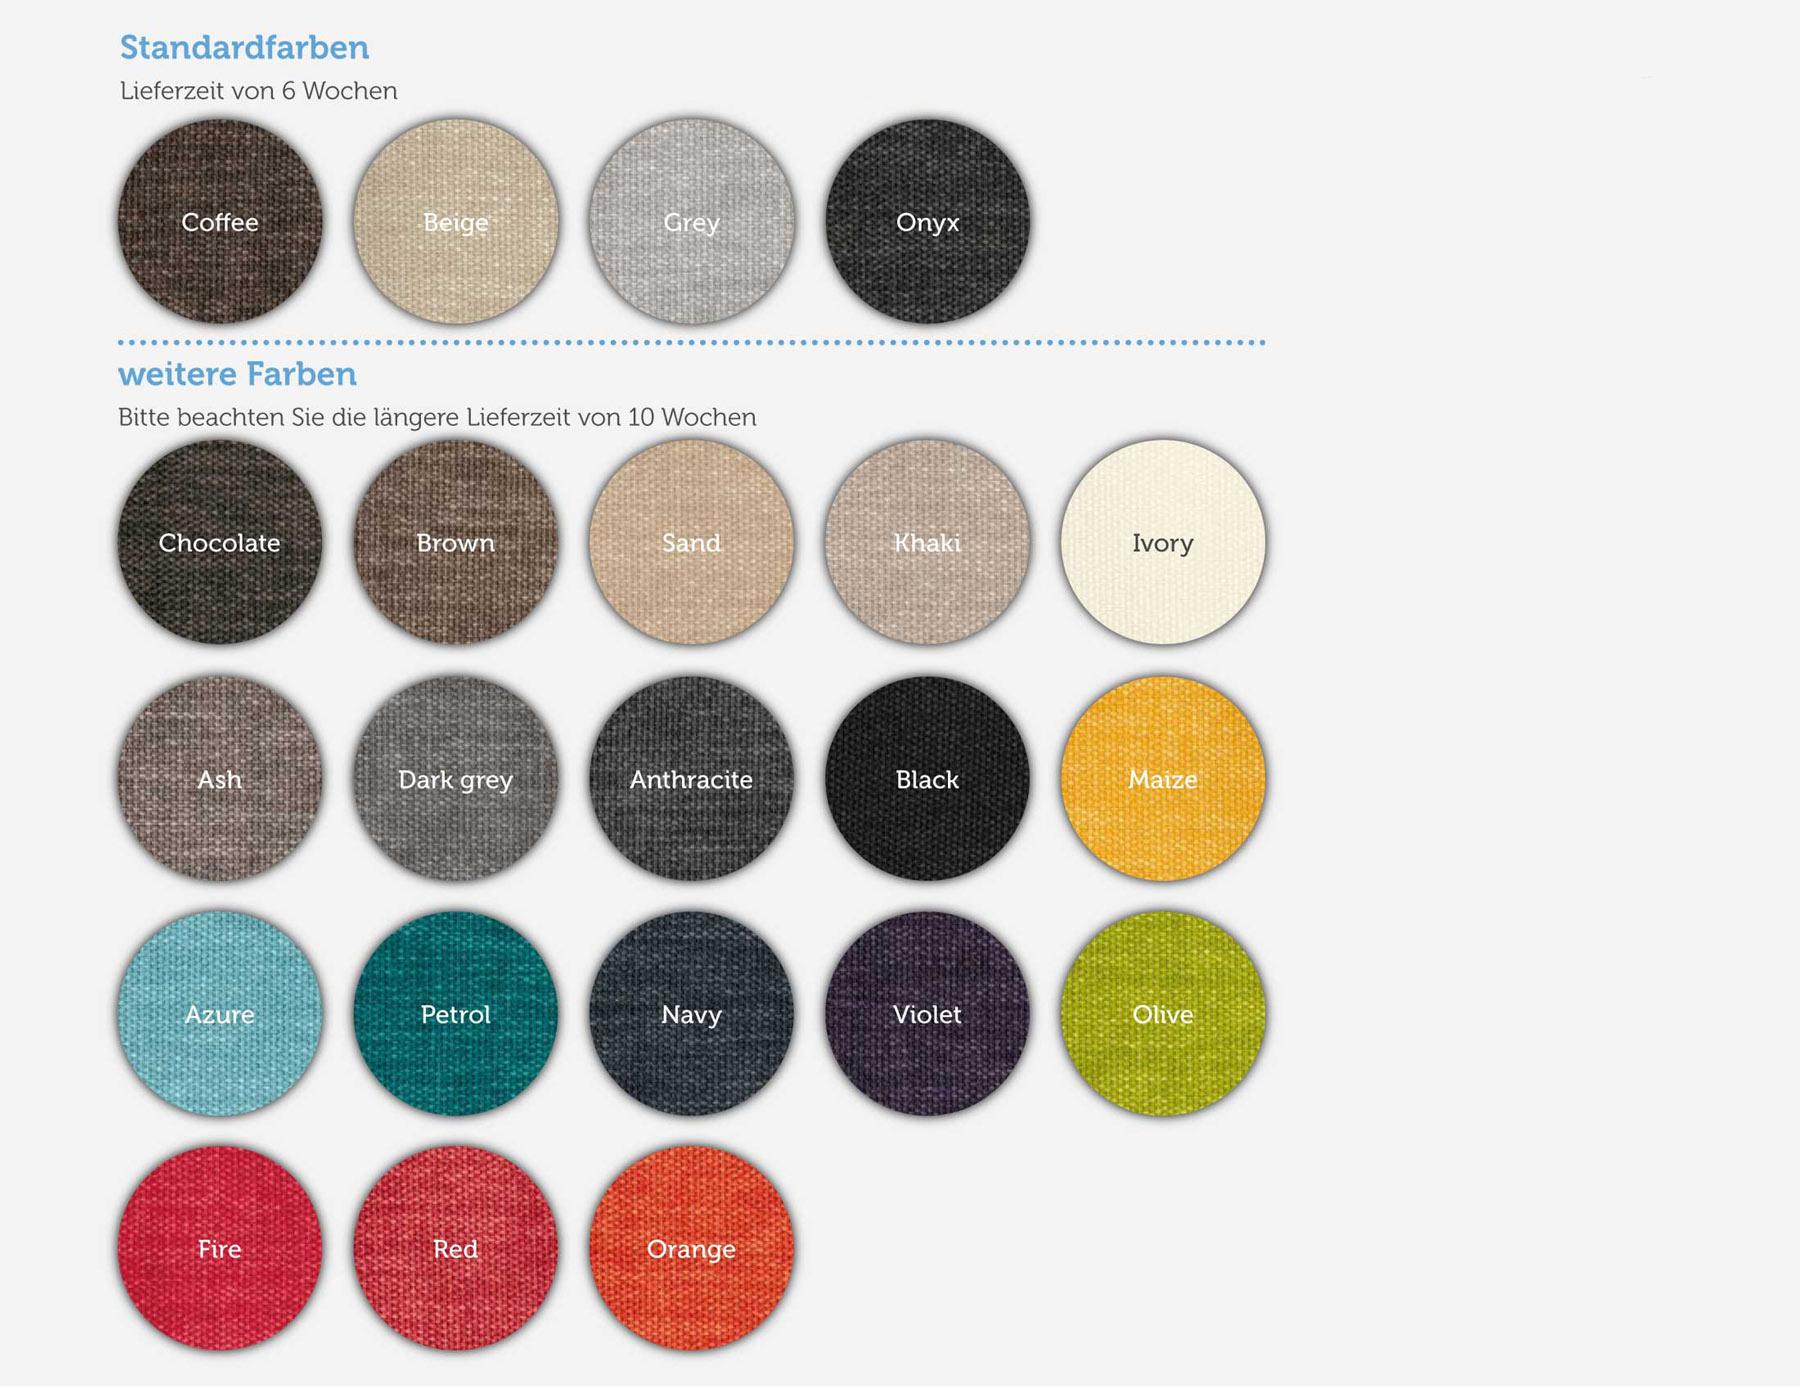 sealy boxspringbett foundations plane alle farben und gr en ohne matratze bettgestelle. Black Bedroom Furniture Sets. Home Design Ideas